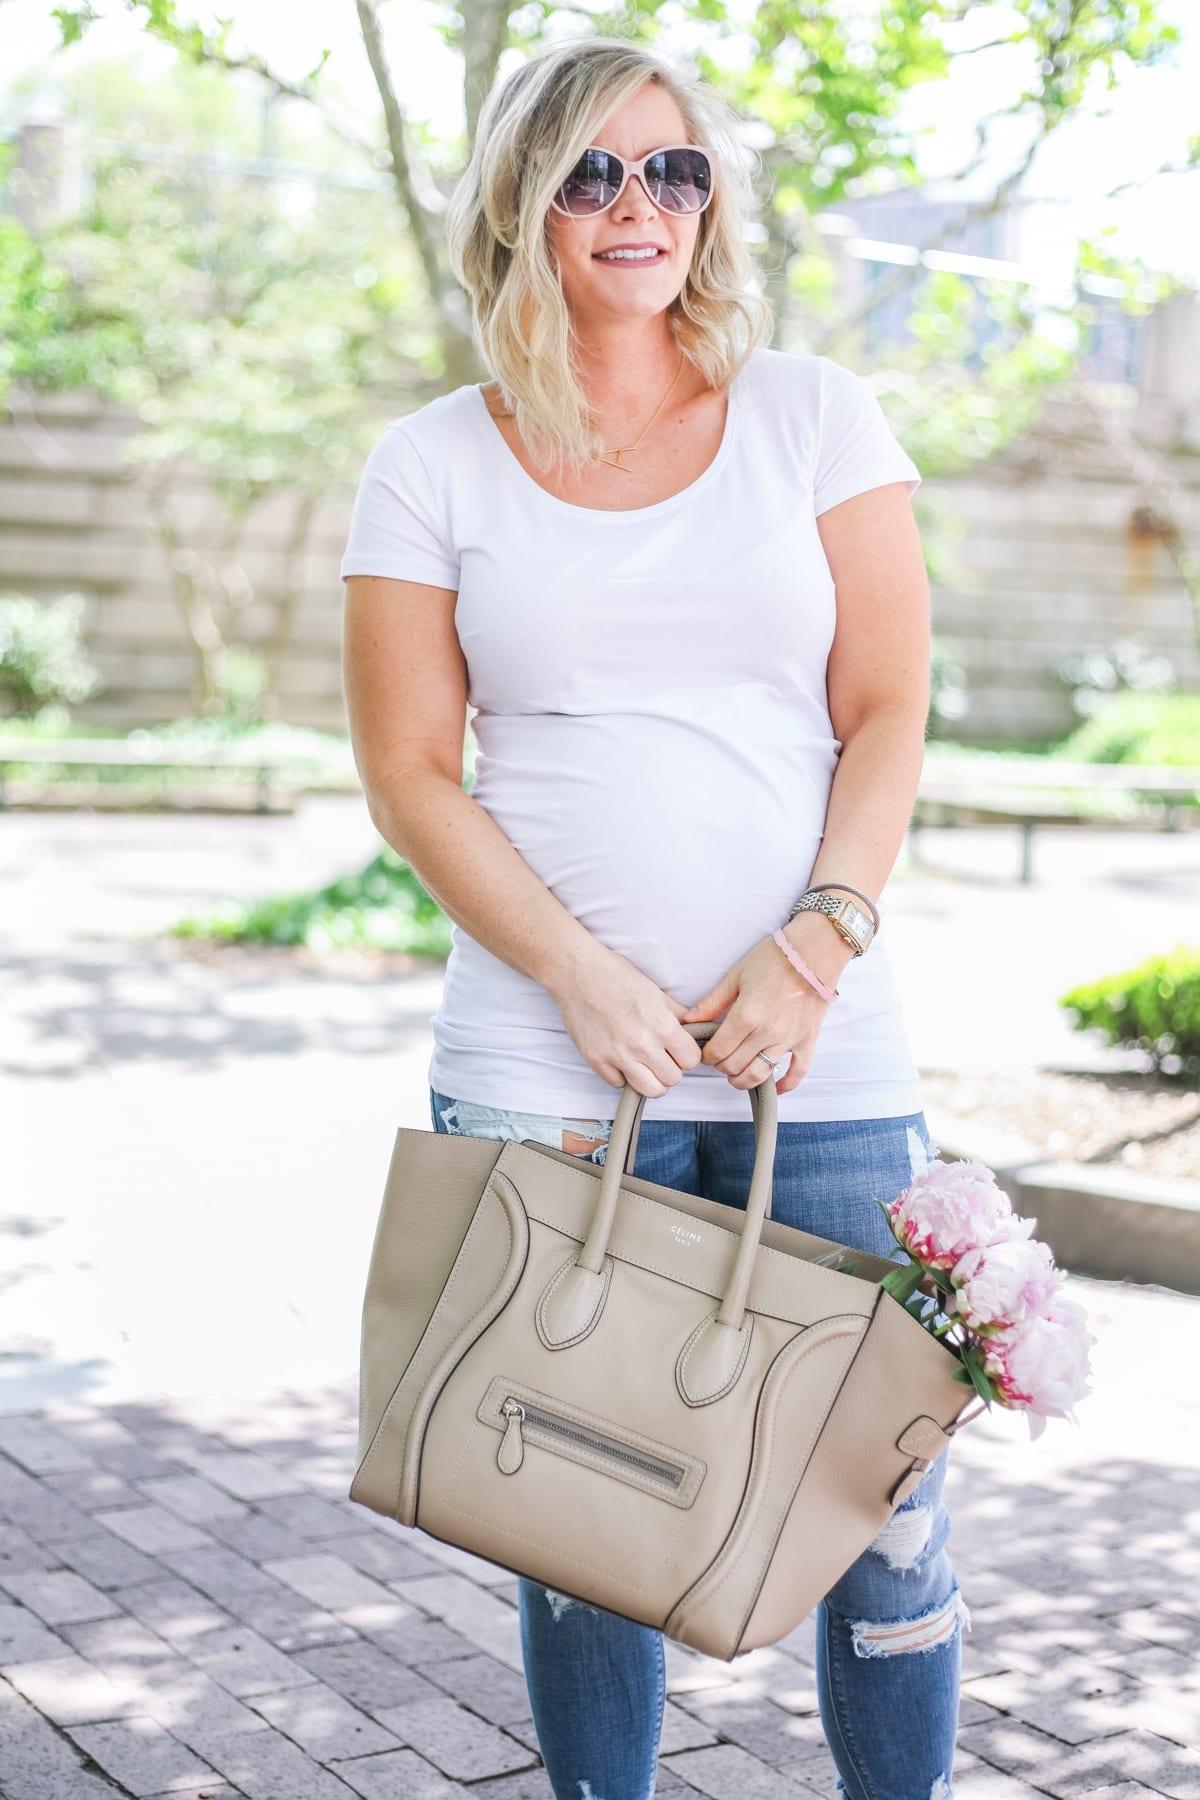 Ashley Pletcher - fashion blogger - Celine bag - mom blog - maternity - ripped jeans - flowers - peonies - white tee shirt